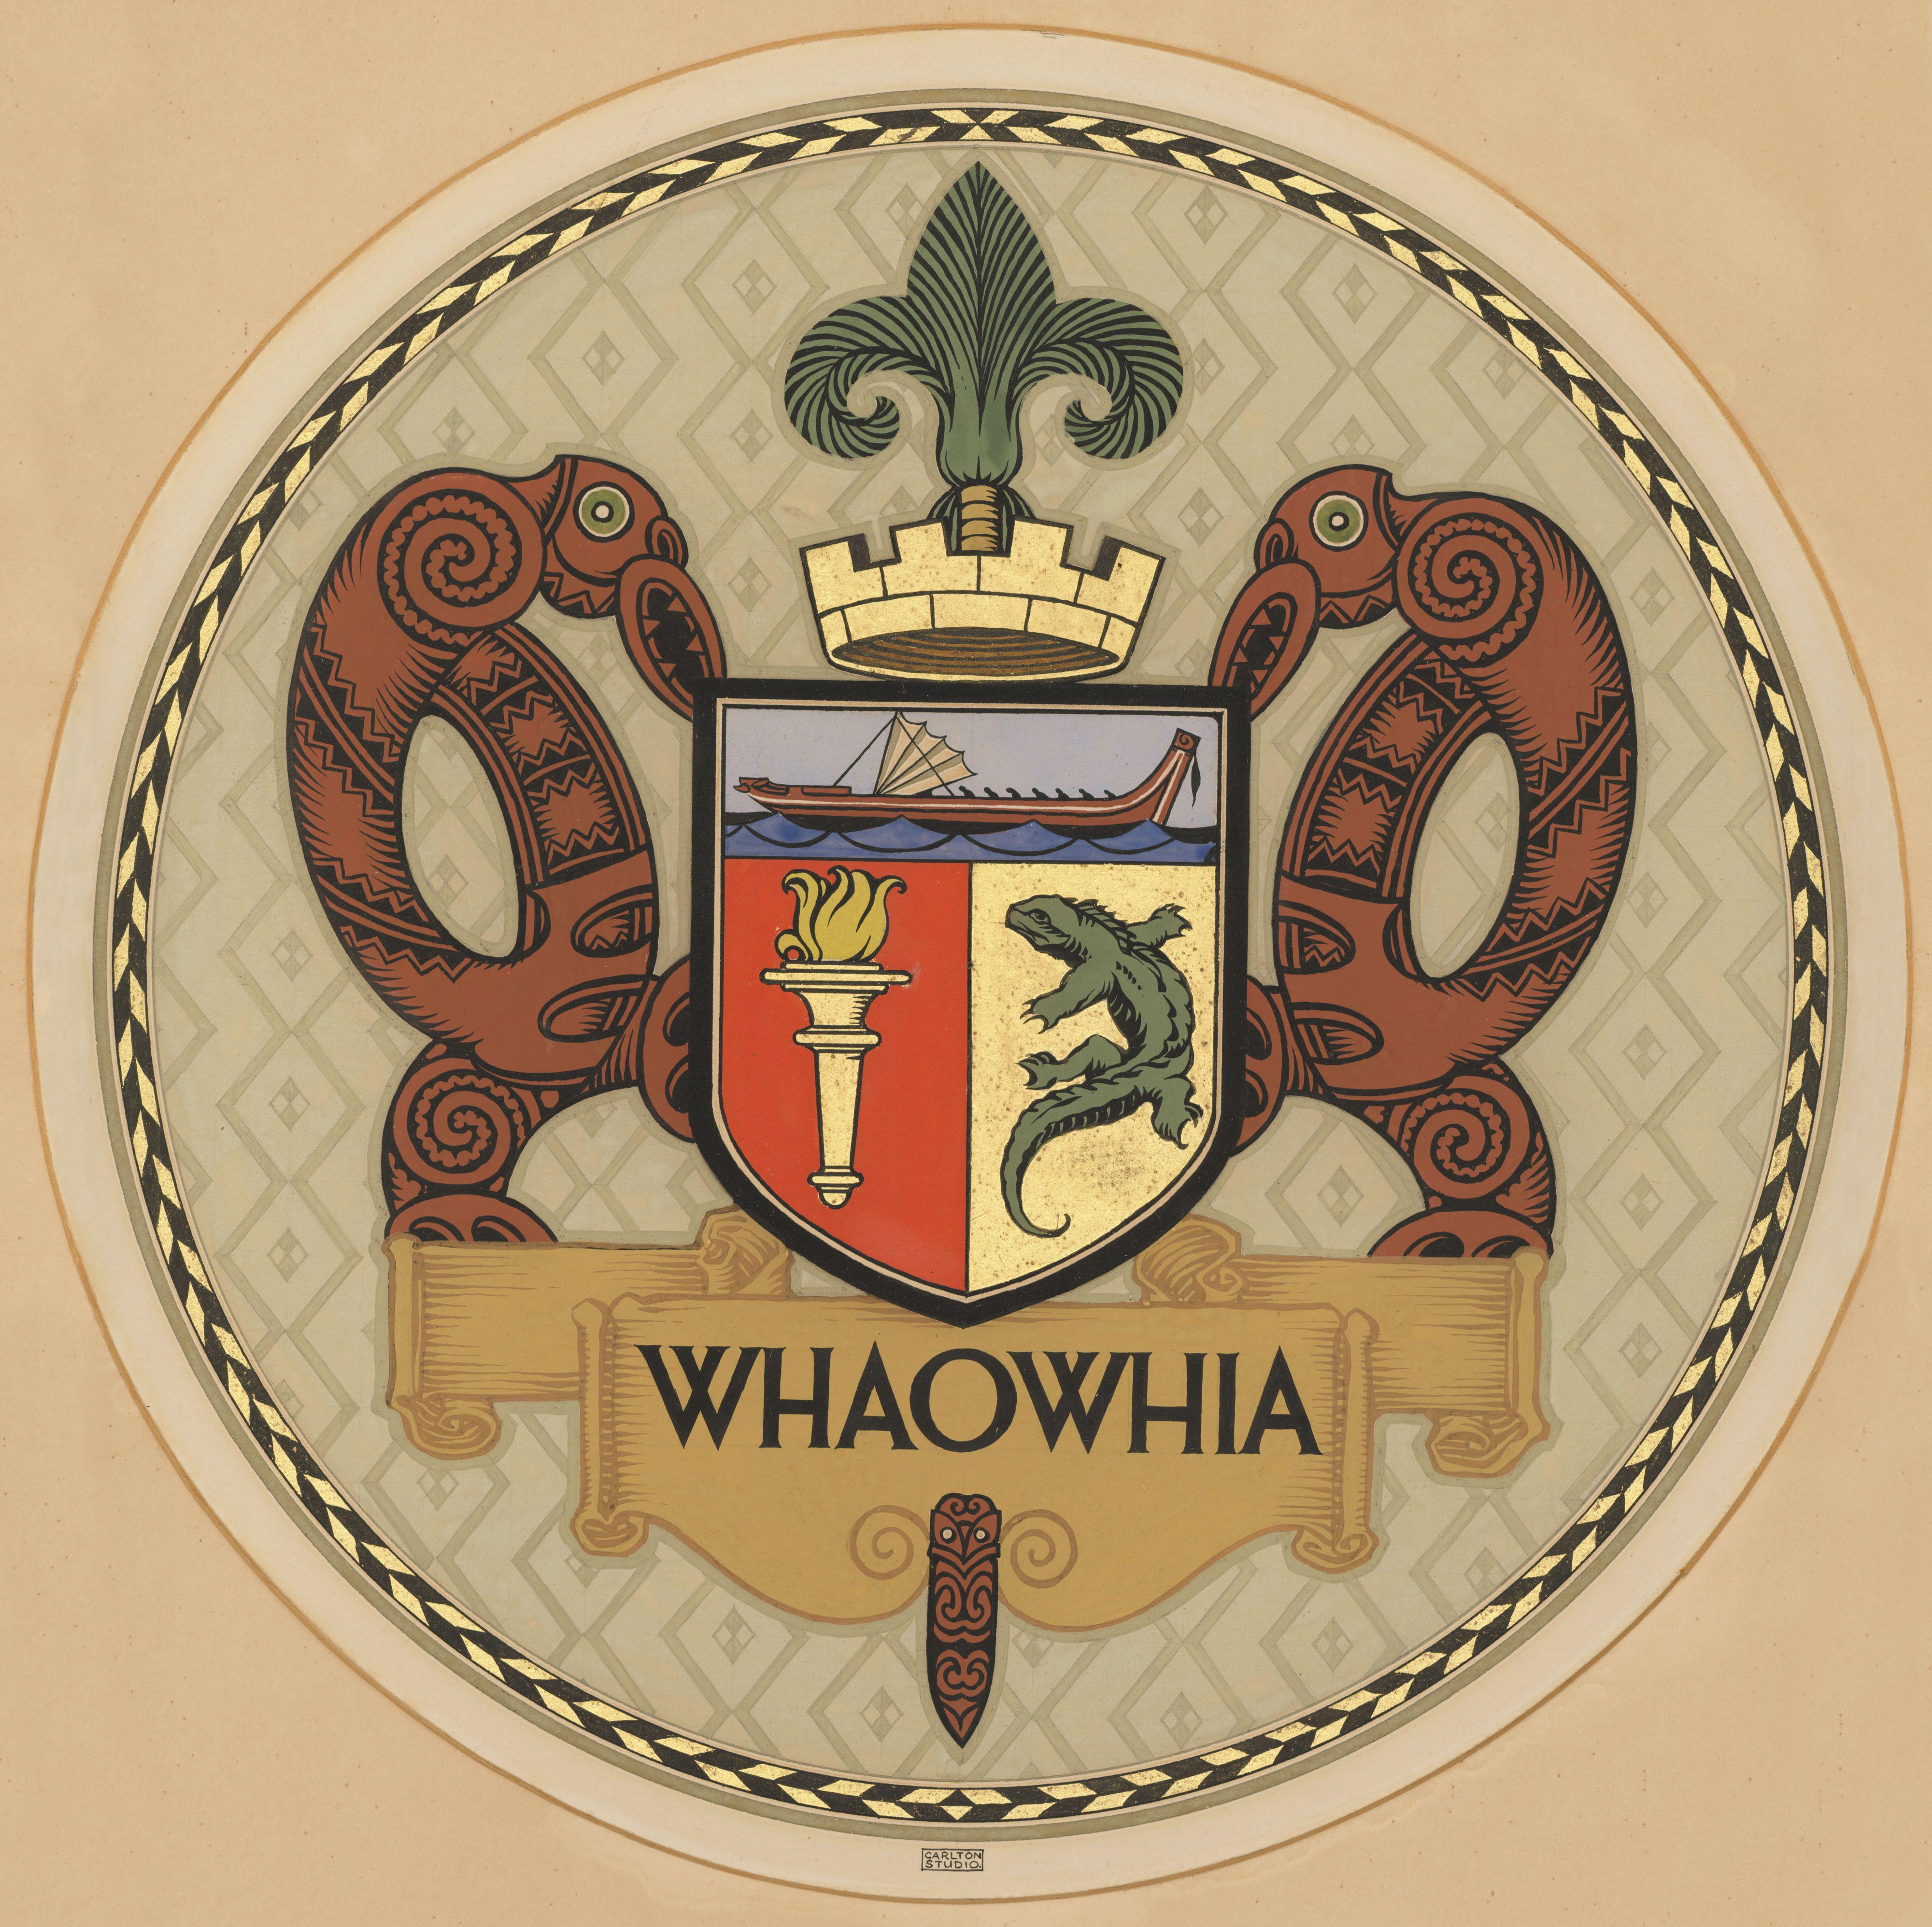 Whaowhia Auckland Museum And Institute Coat Of Arms